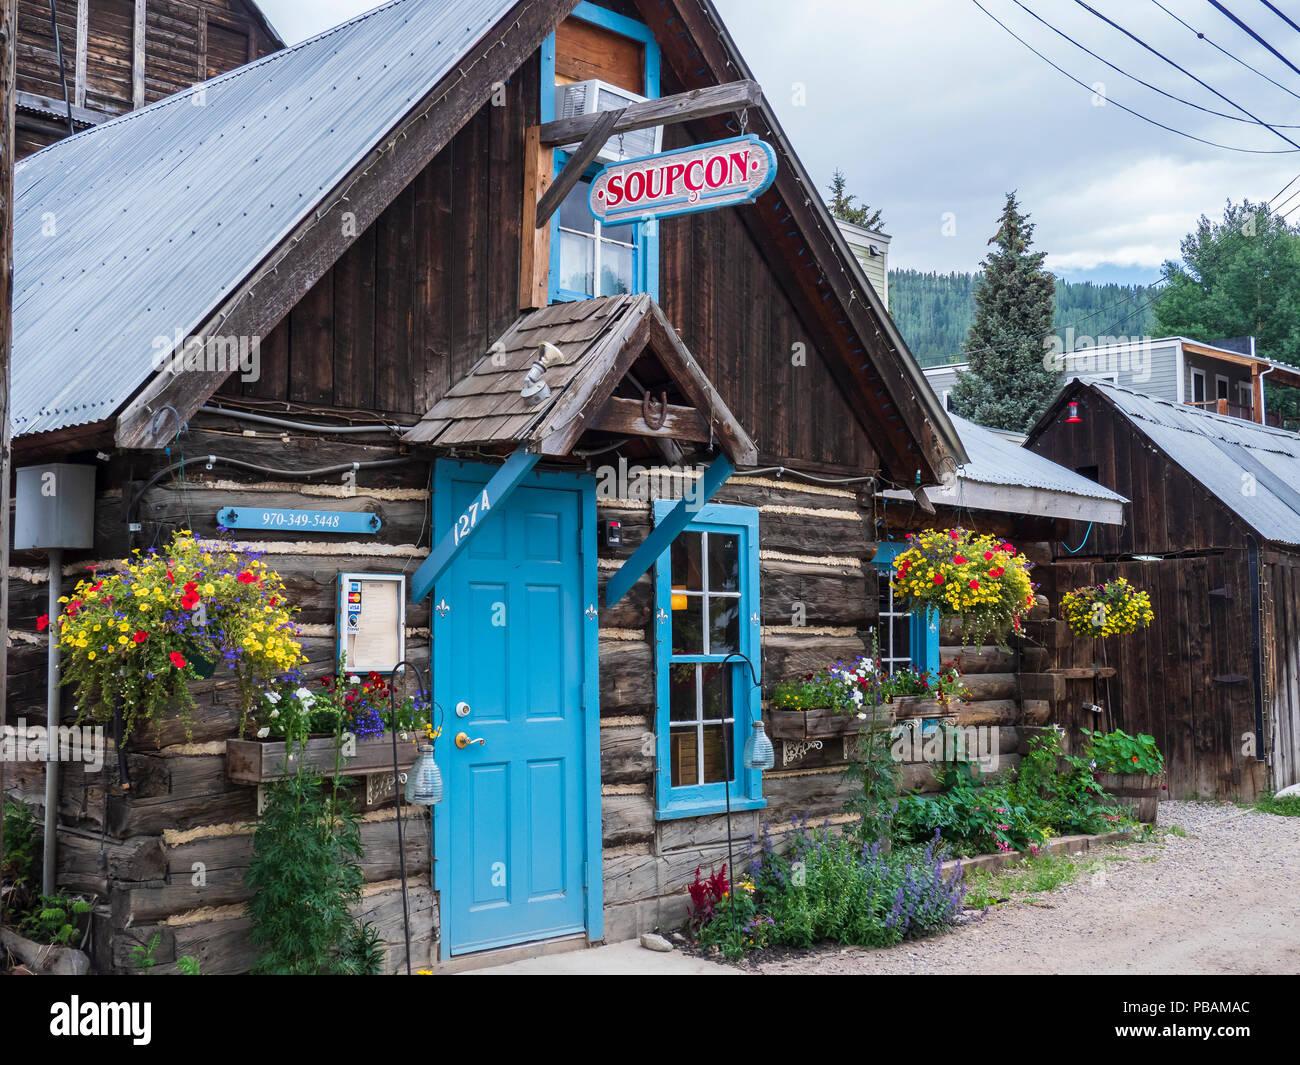 Soupçon Restaurant, Crested Butte, Colorado. - Stock Image